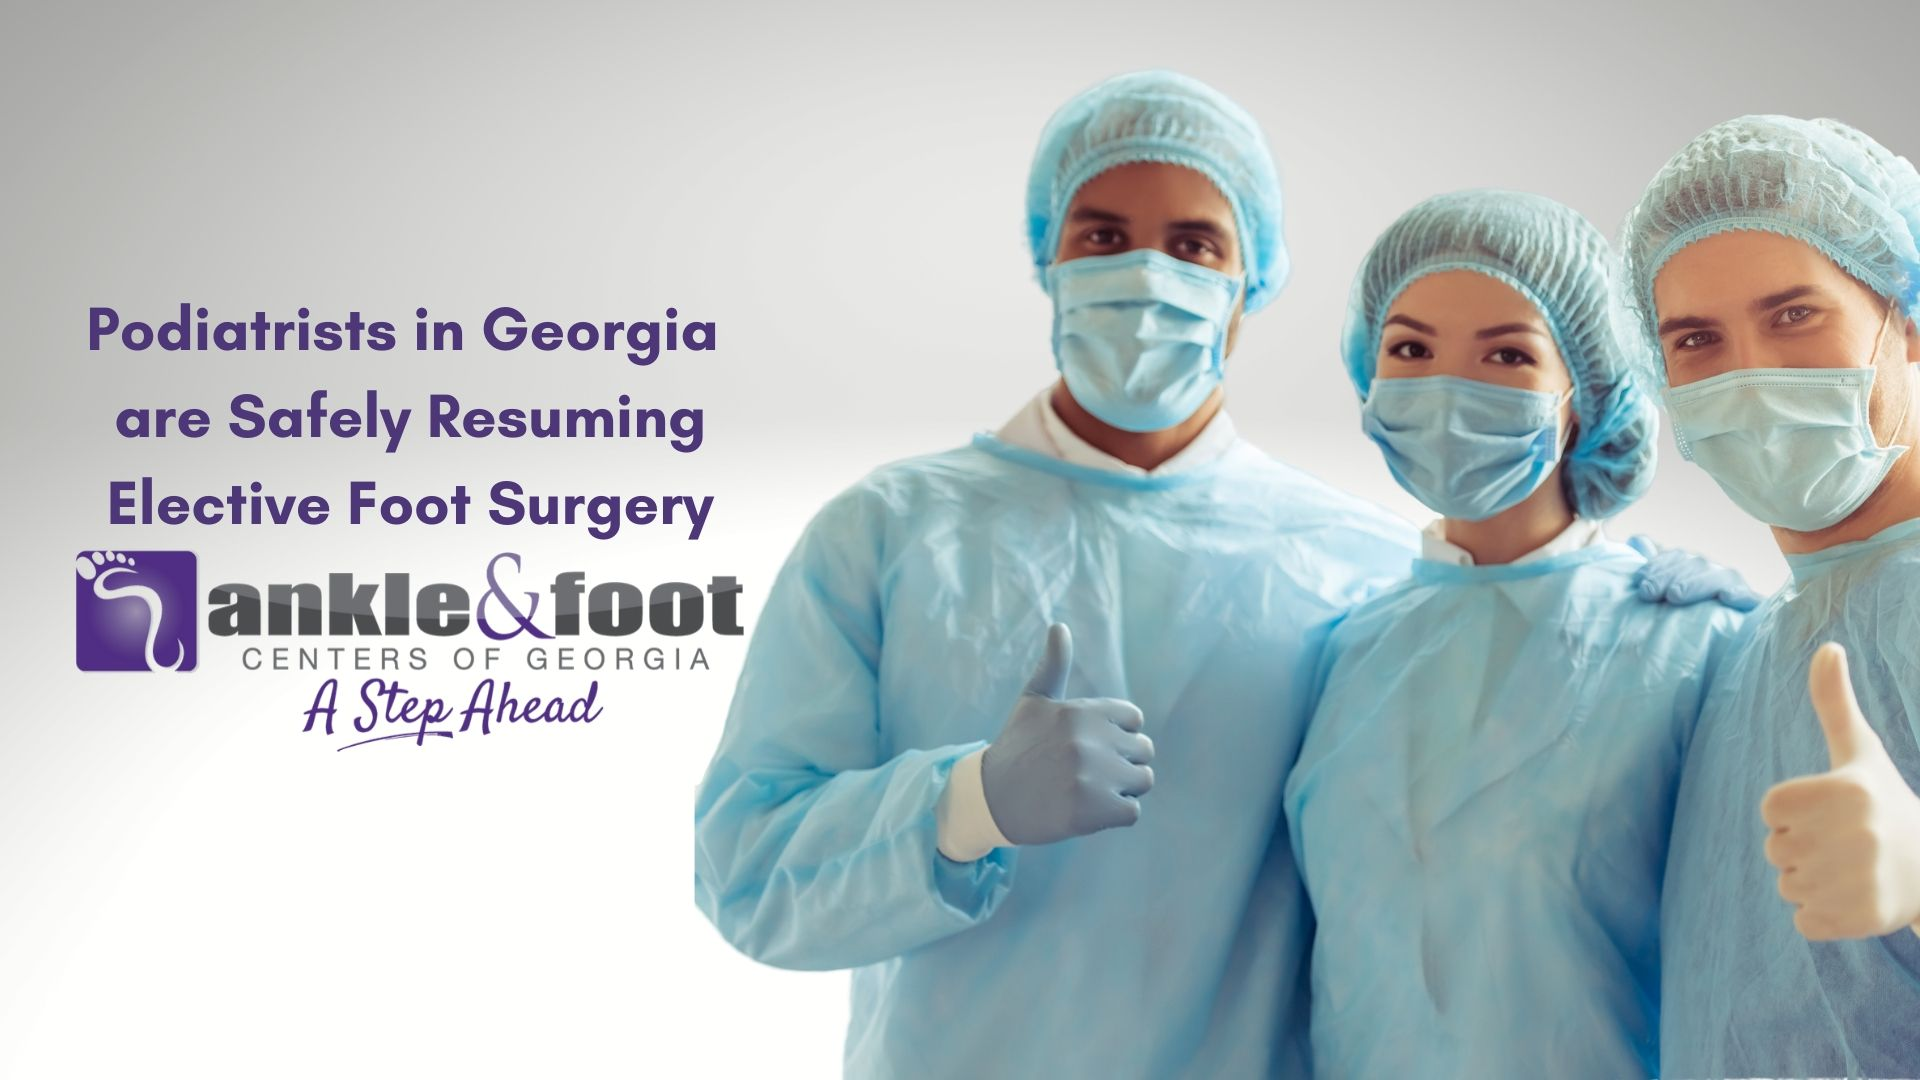 Elective Foot Surgery